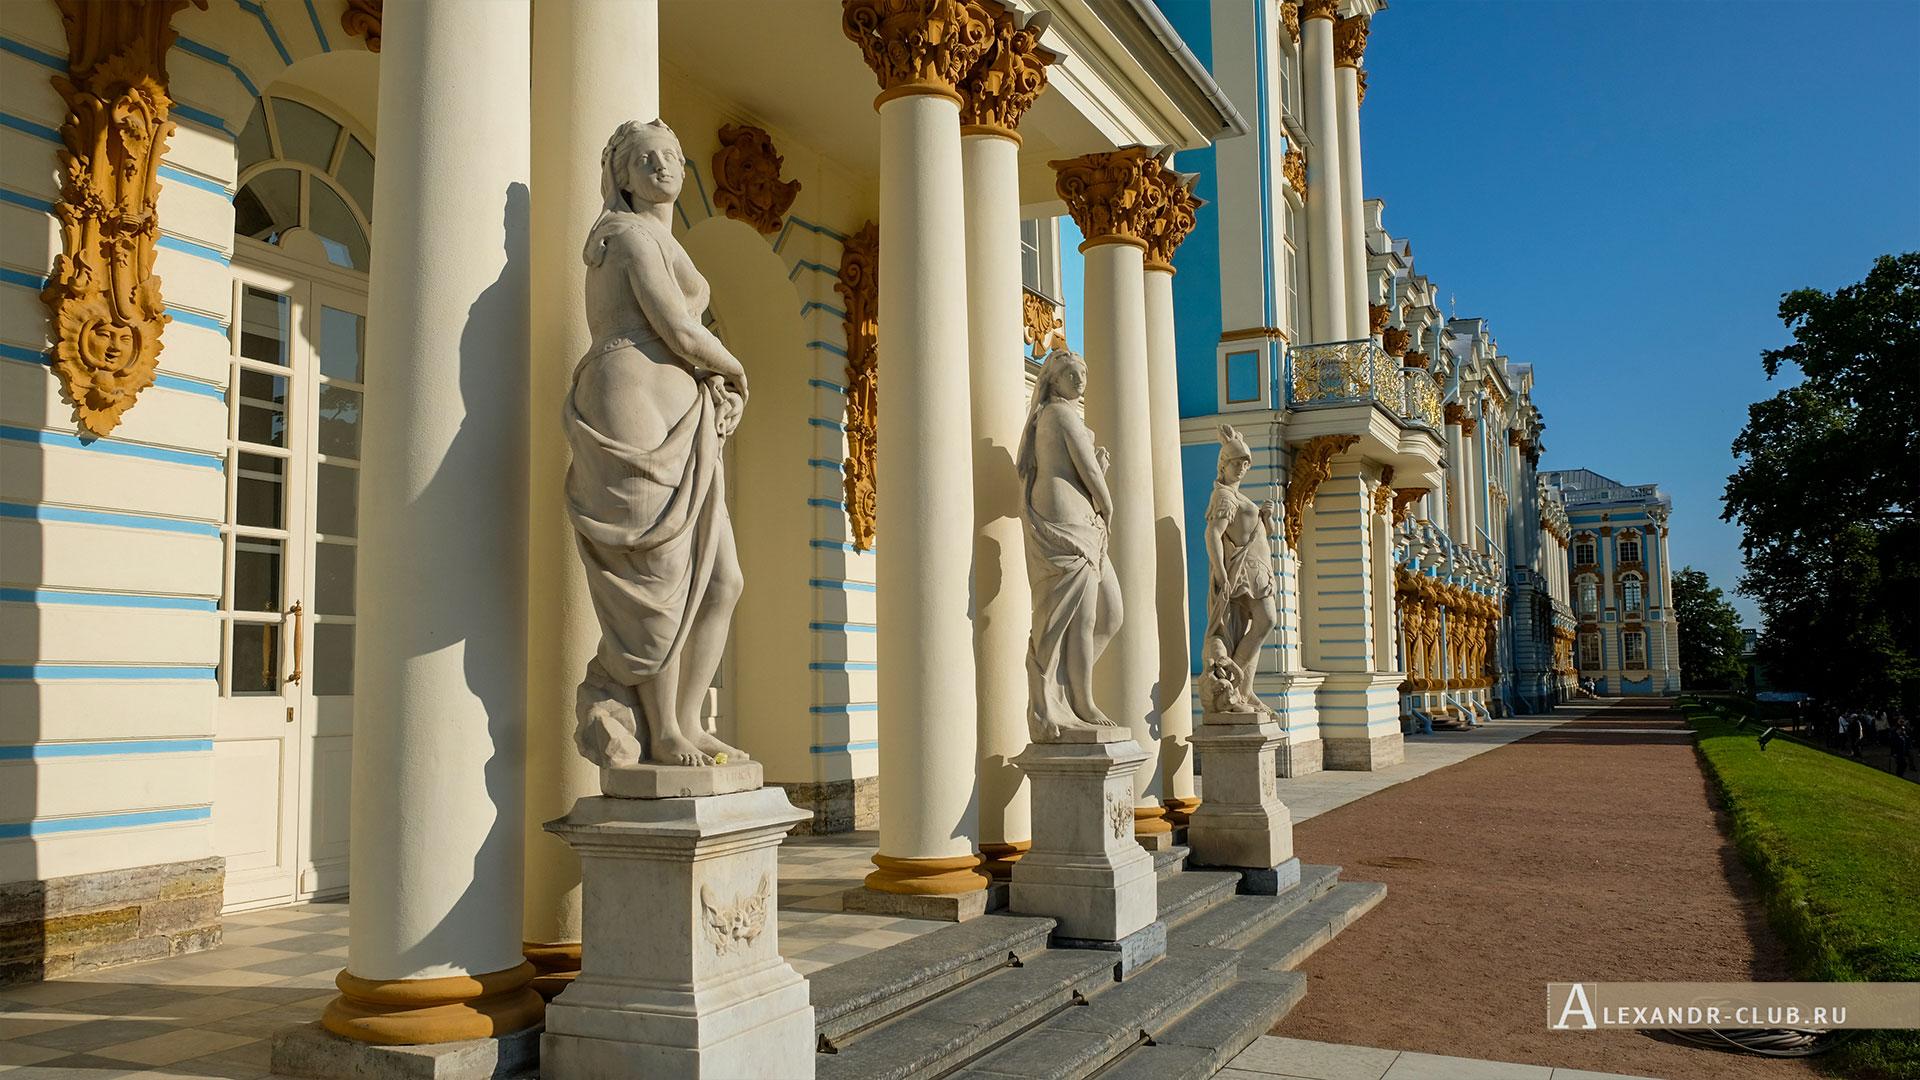 Царское Село, лето, Екатерининский парк, Екатерининский дворец